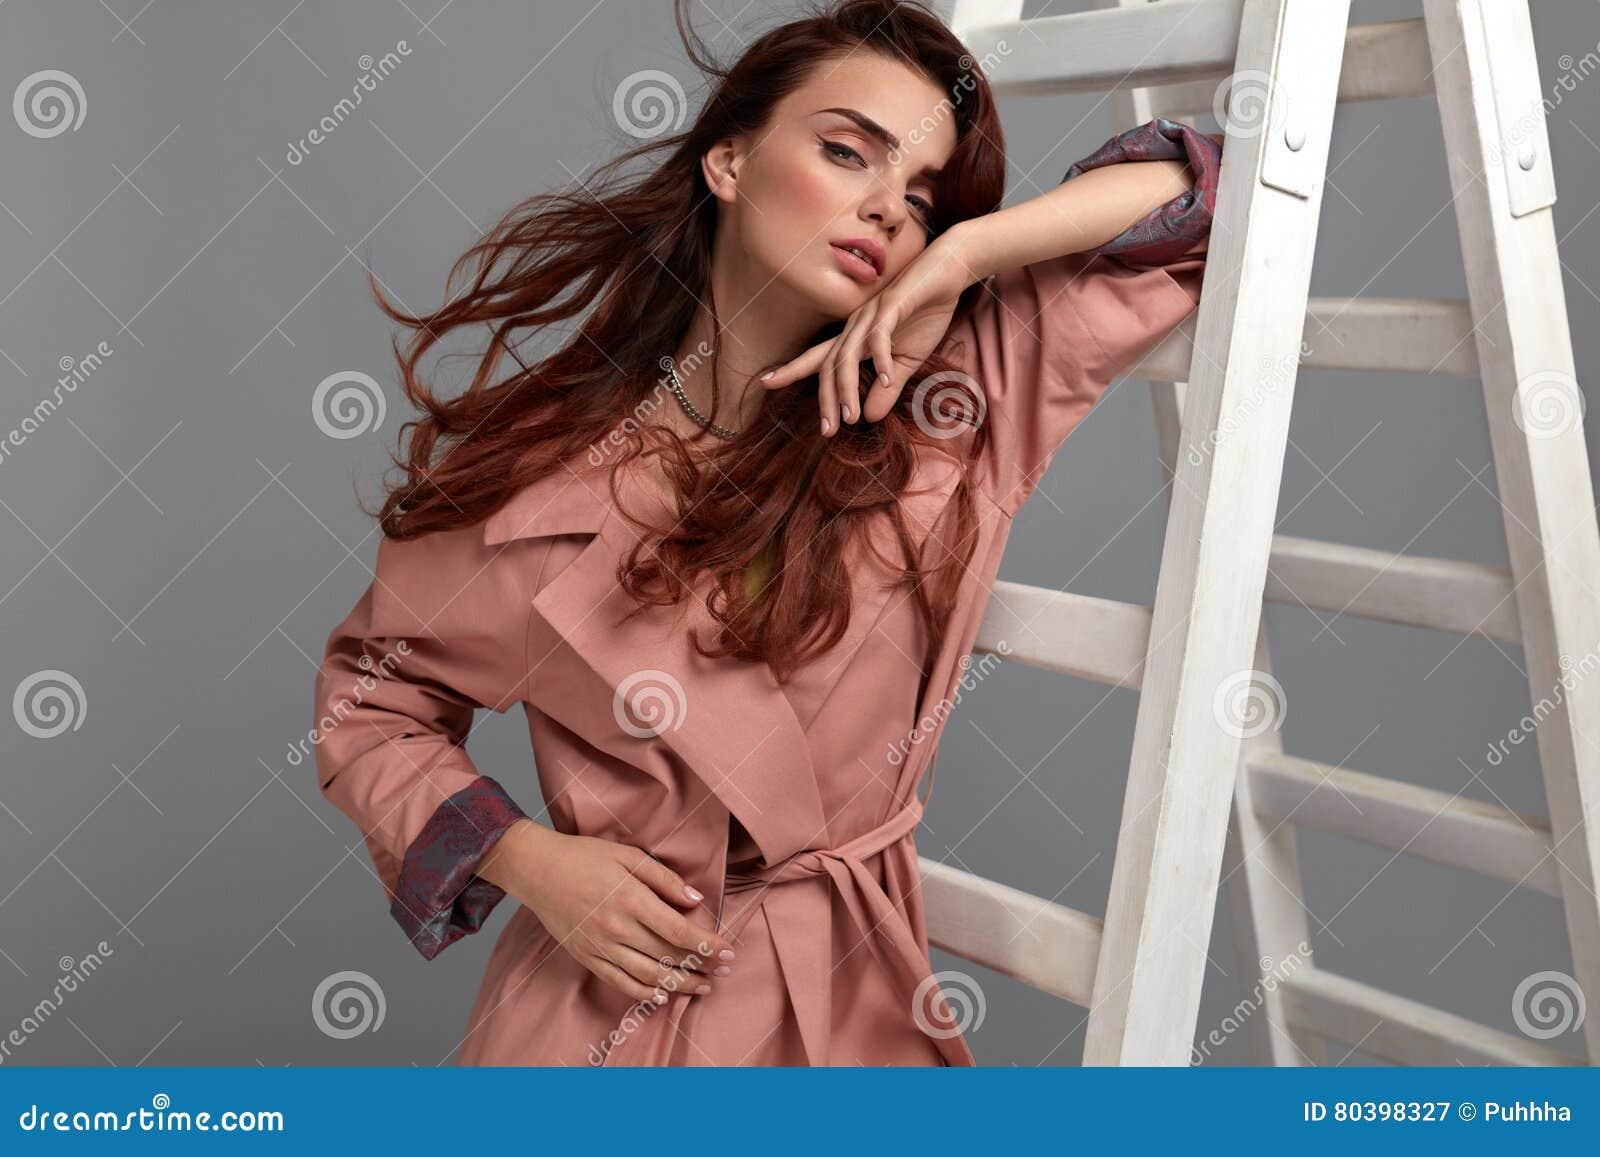 Beautiful Woman, Fashion Girl In Fashionable Clothes In Studio